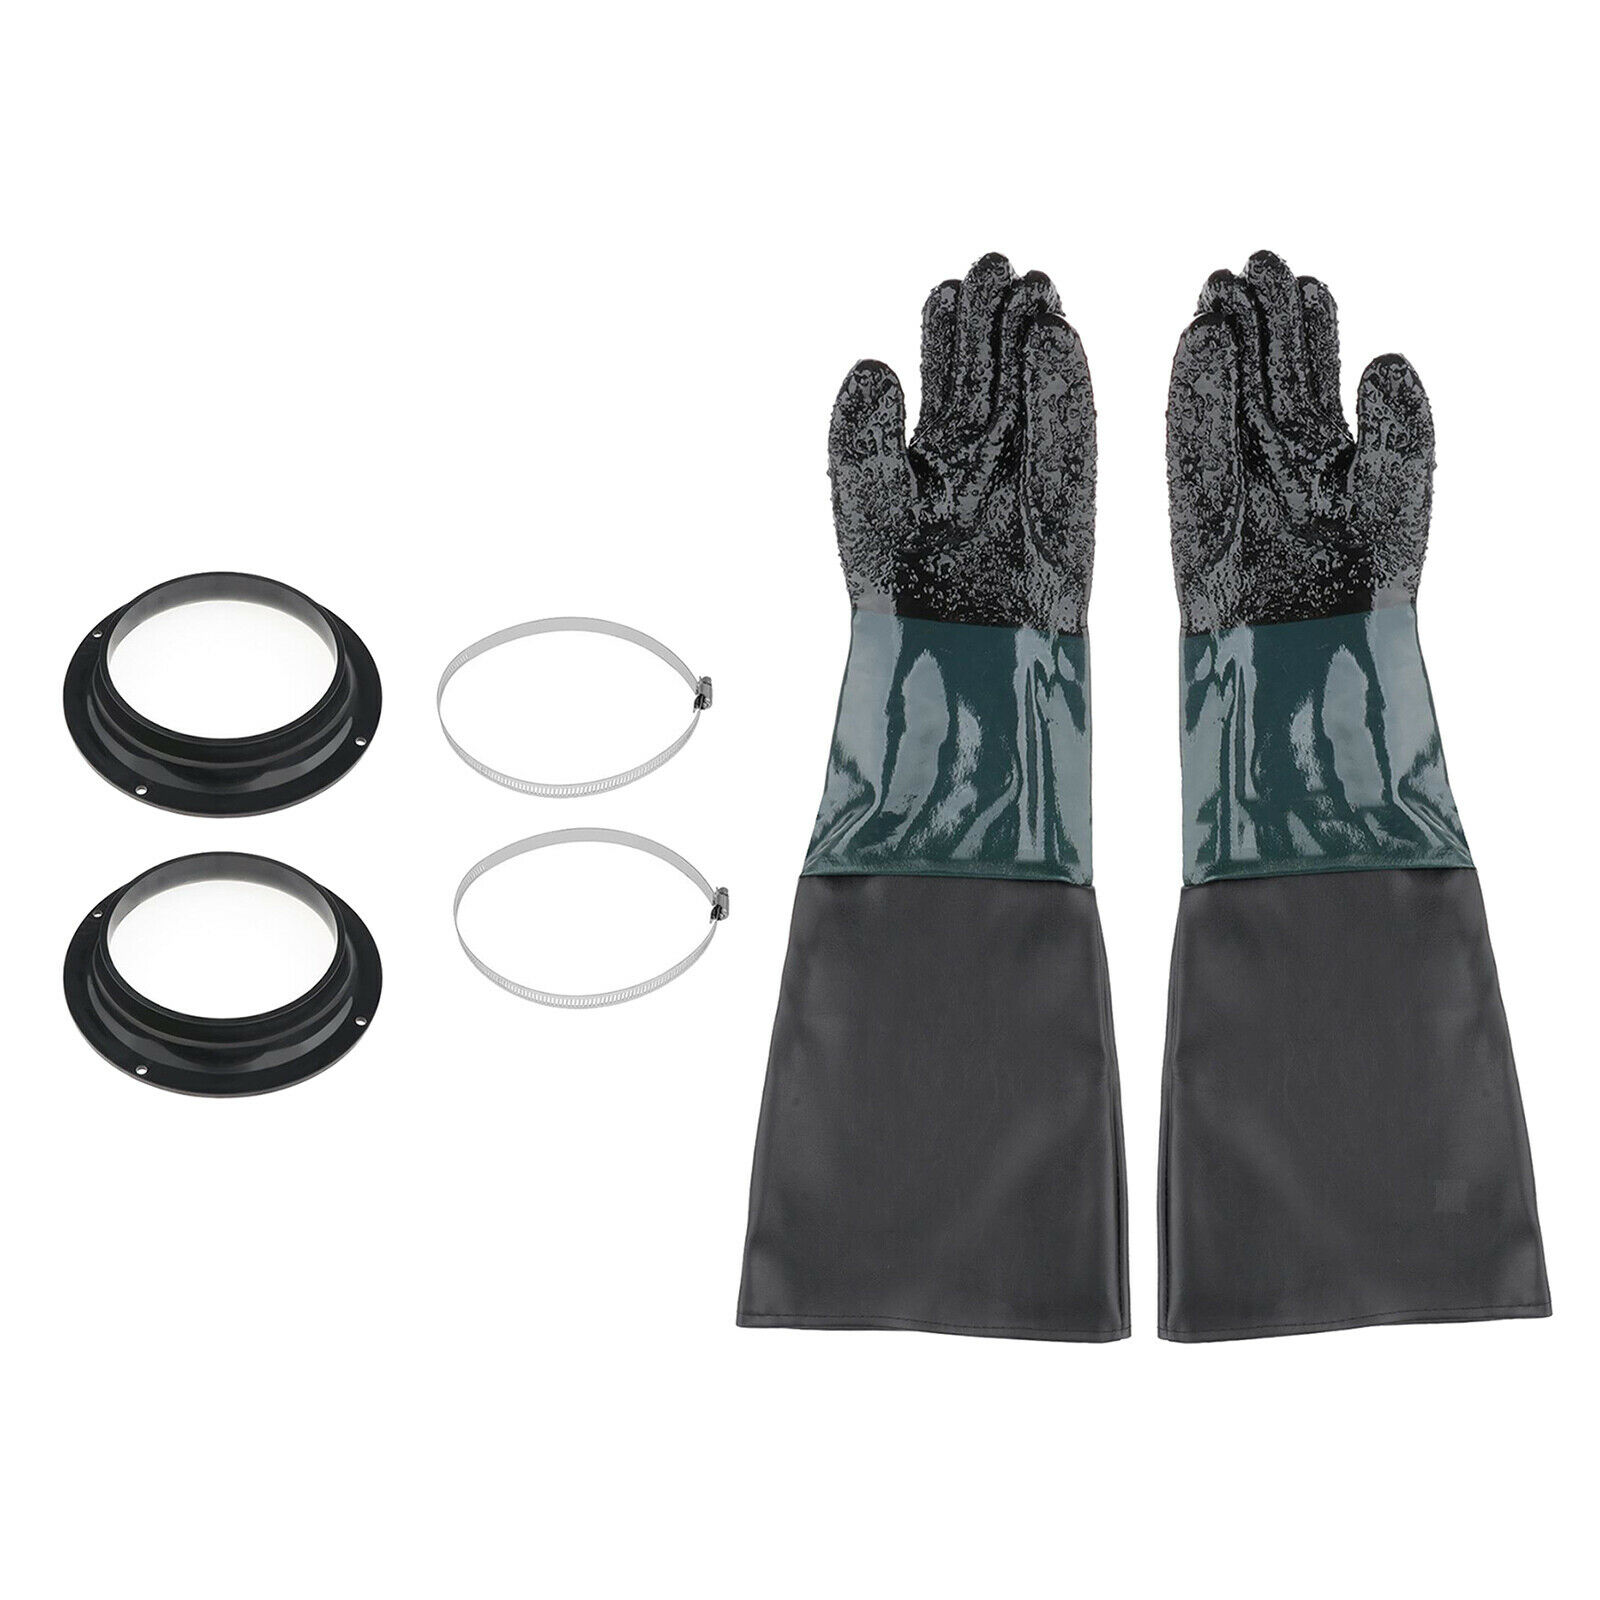 1 Pair Heavy Duty Sandblast Gloves + Holders + Clamp for Sand Blast Cabinet